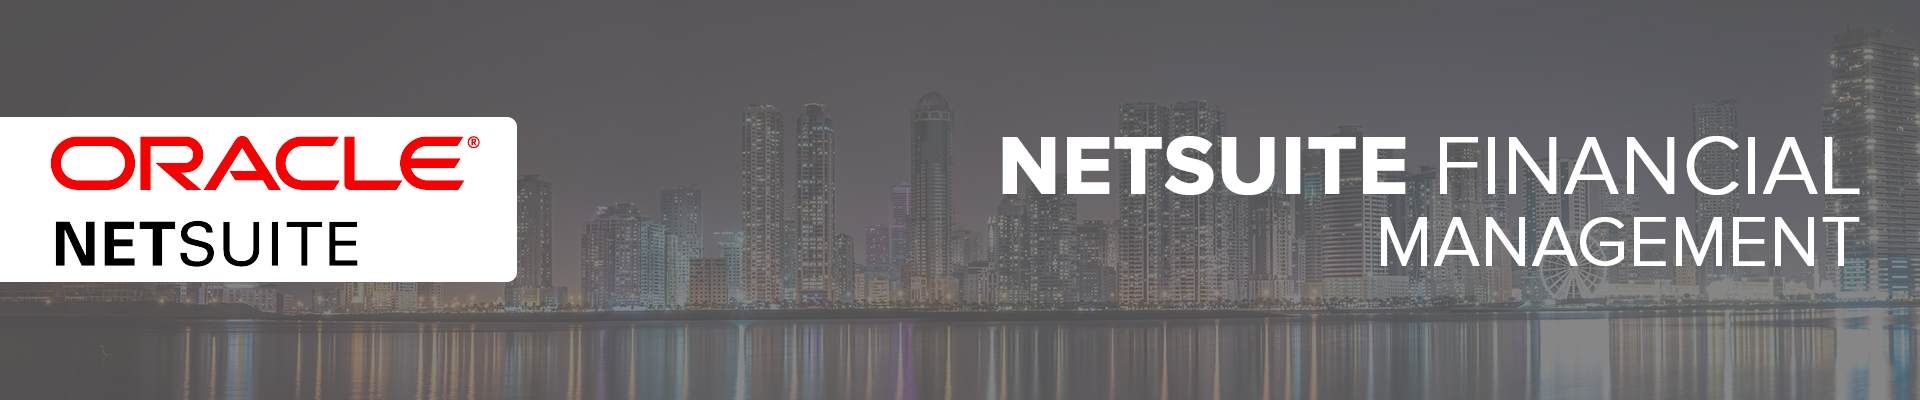 NetSuite Financial